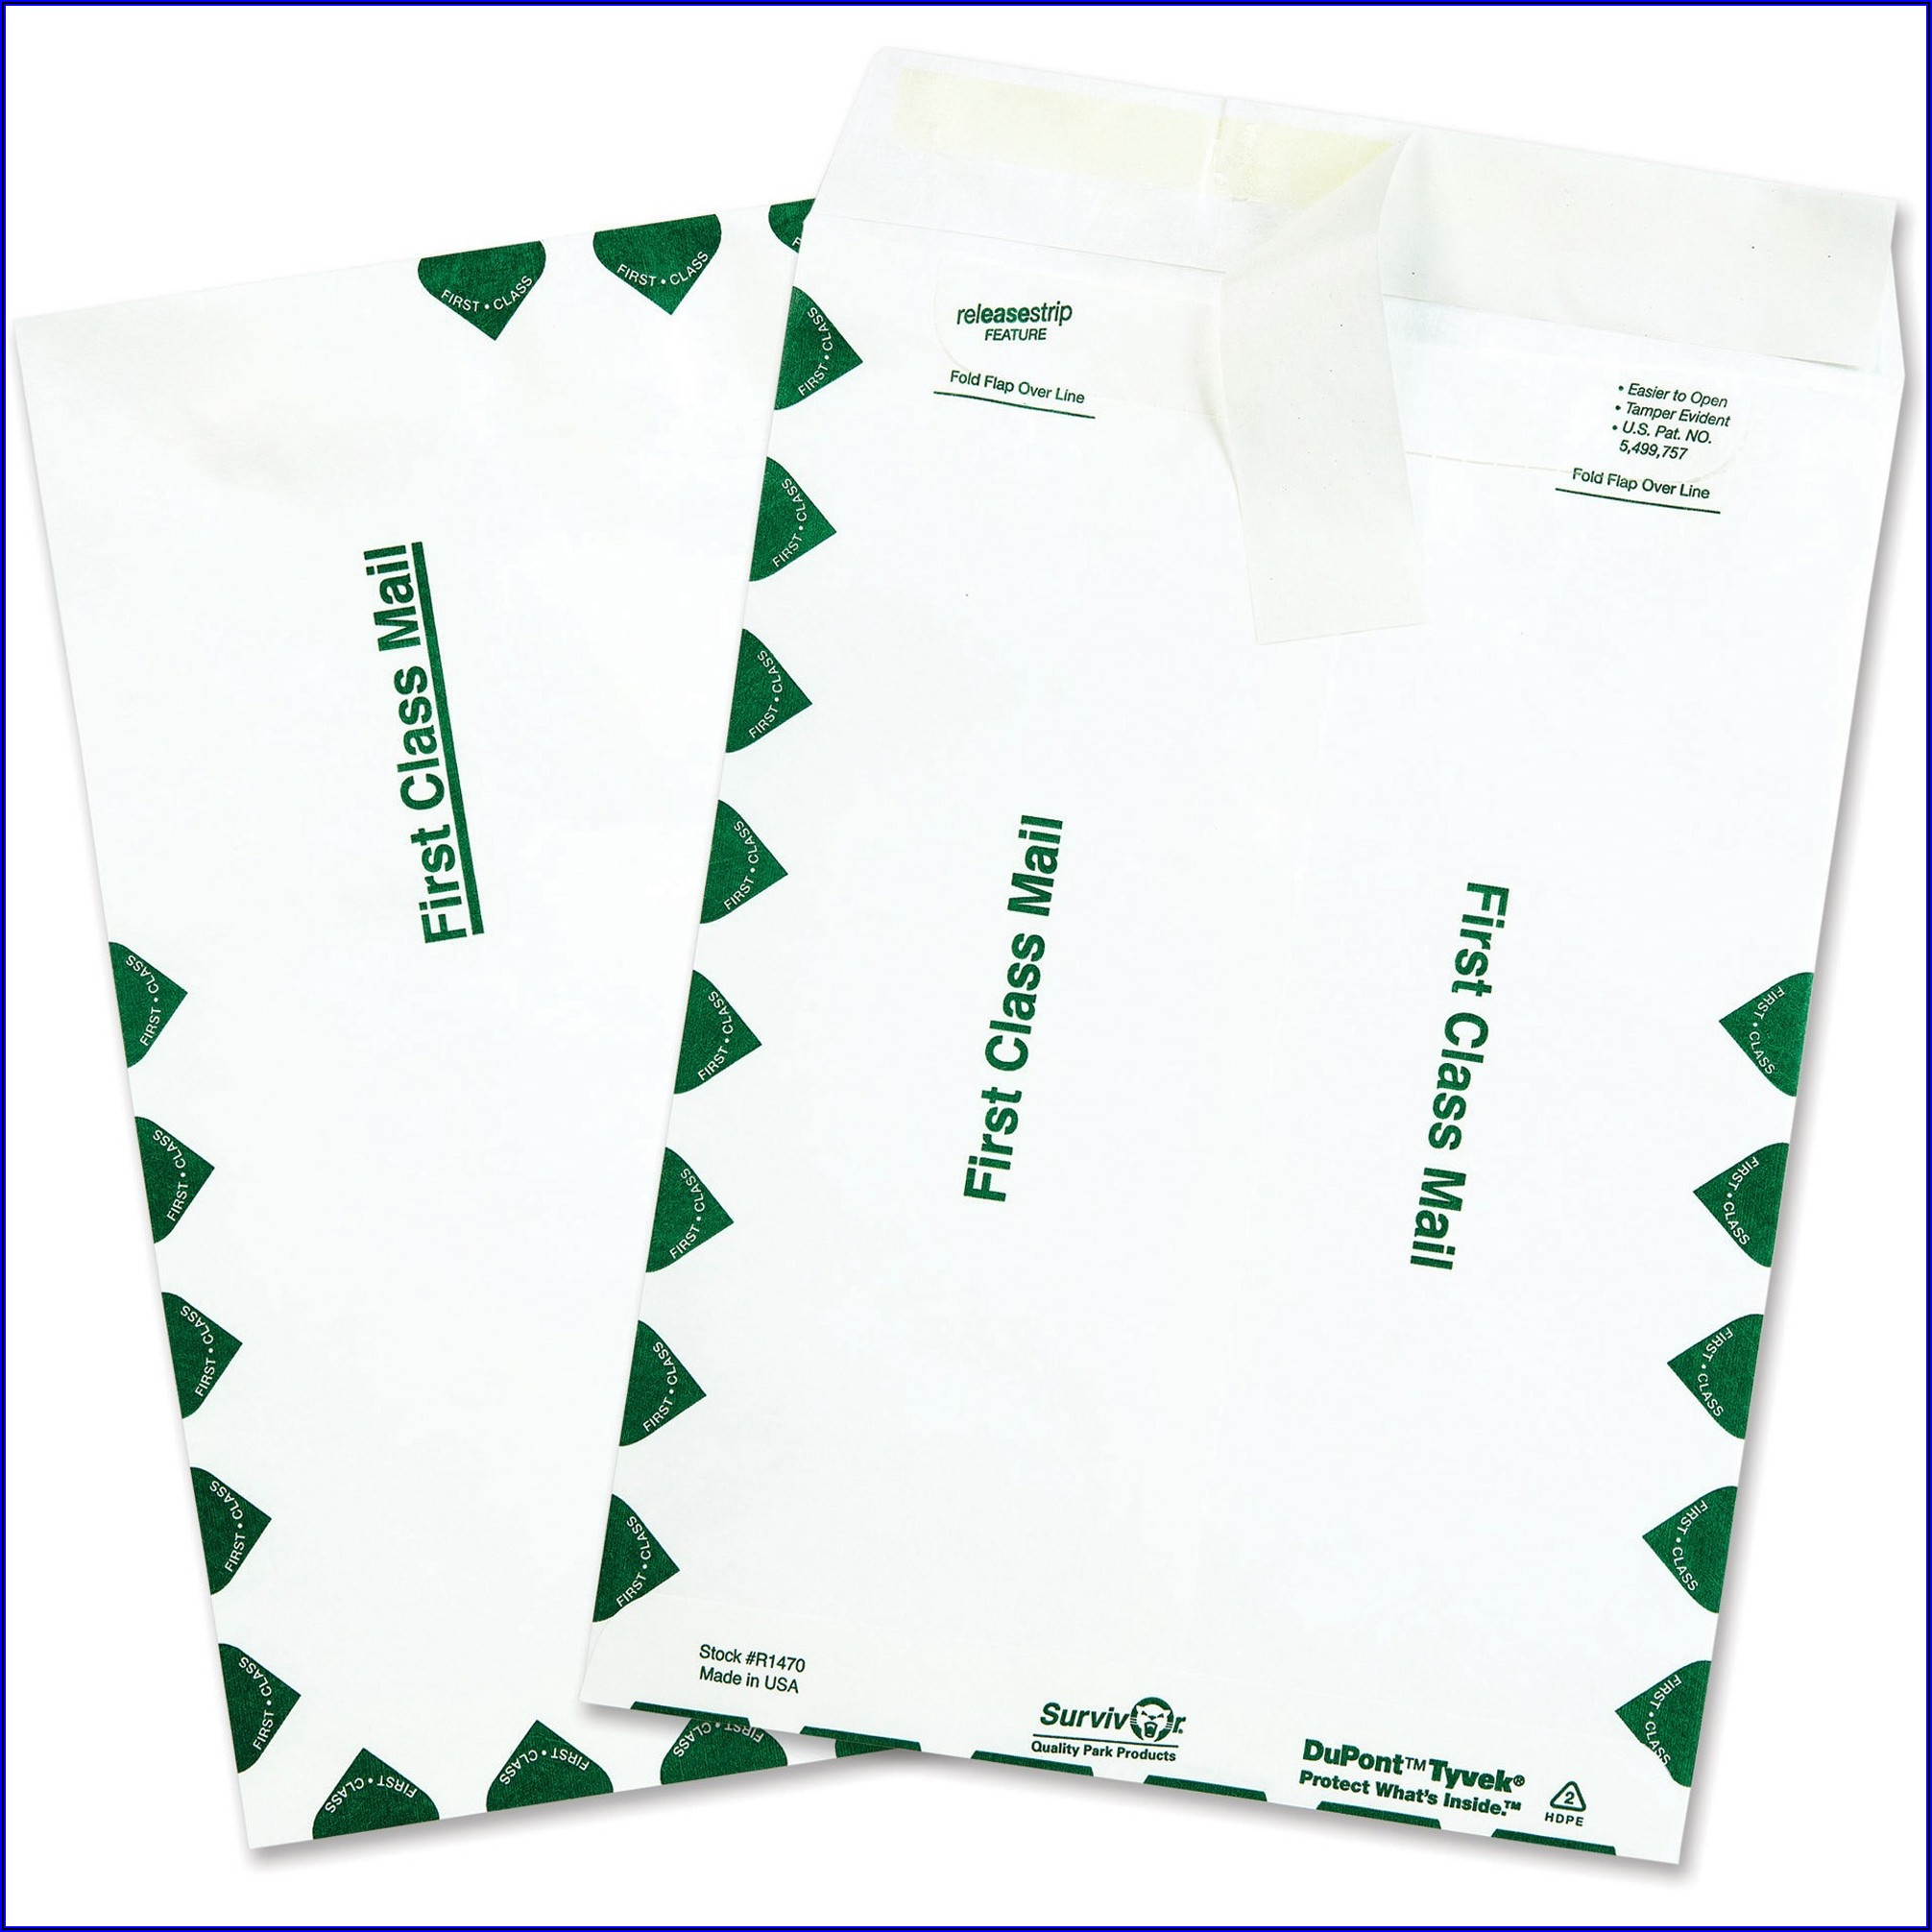 Usps Tyvek Envelope Size